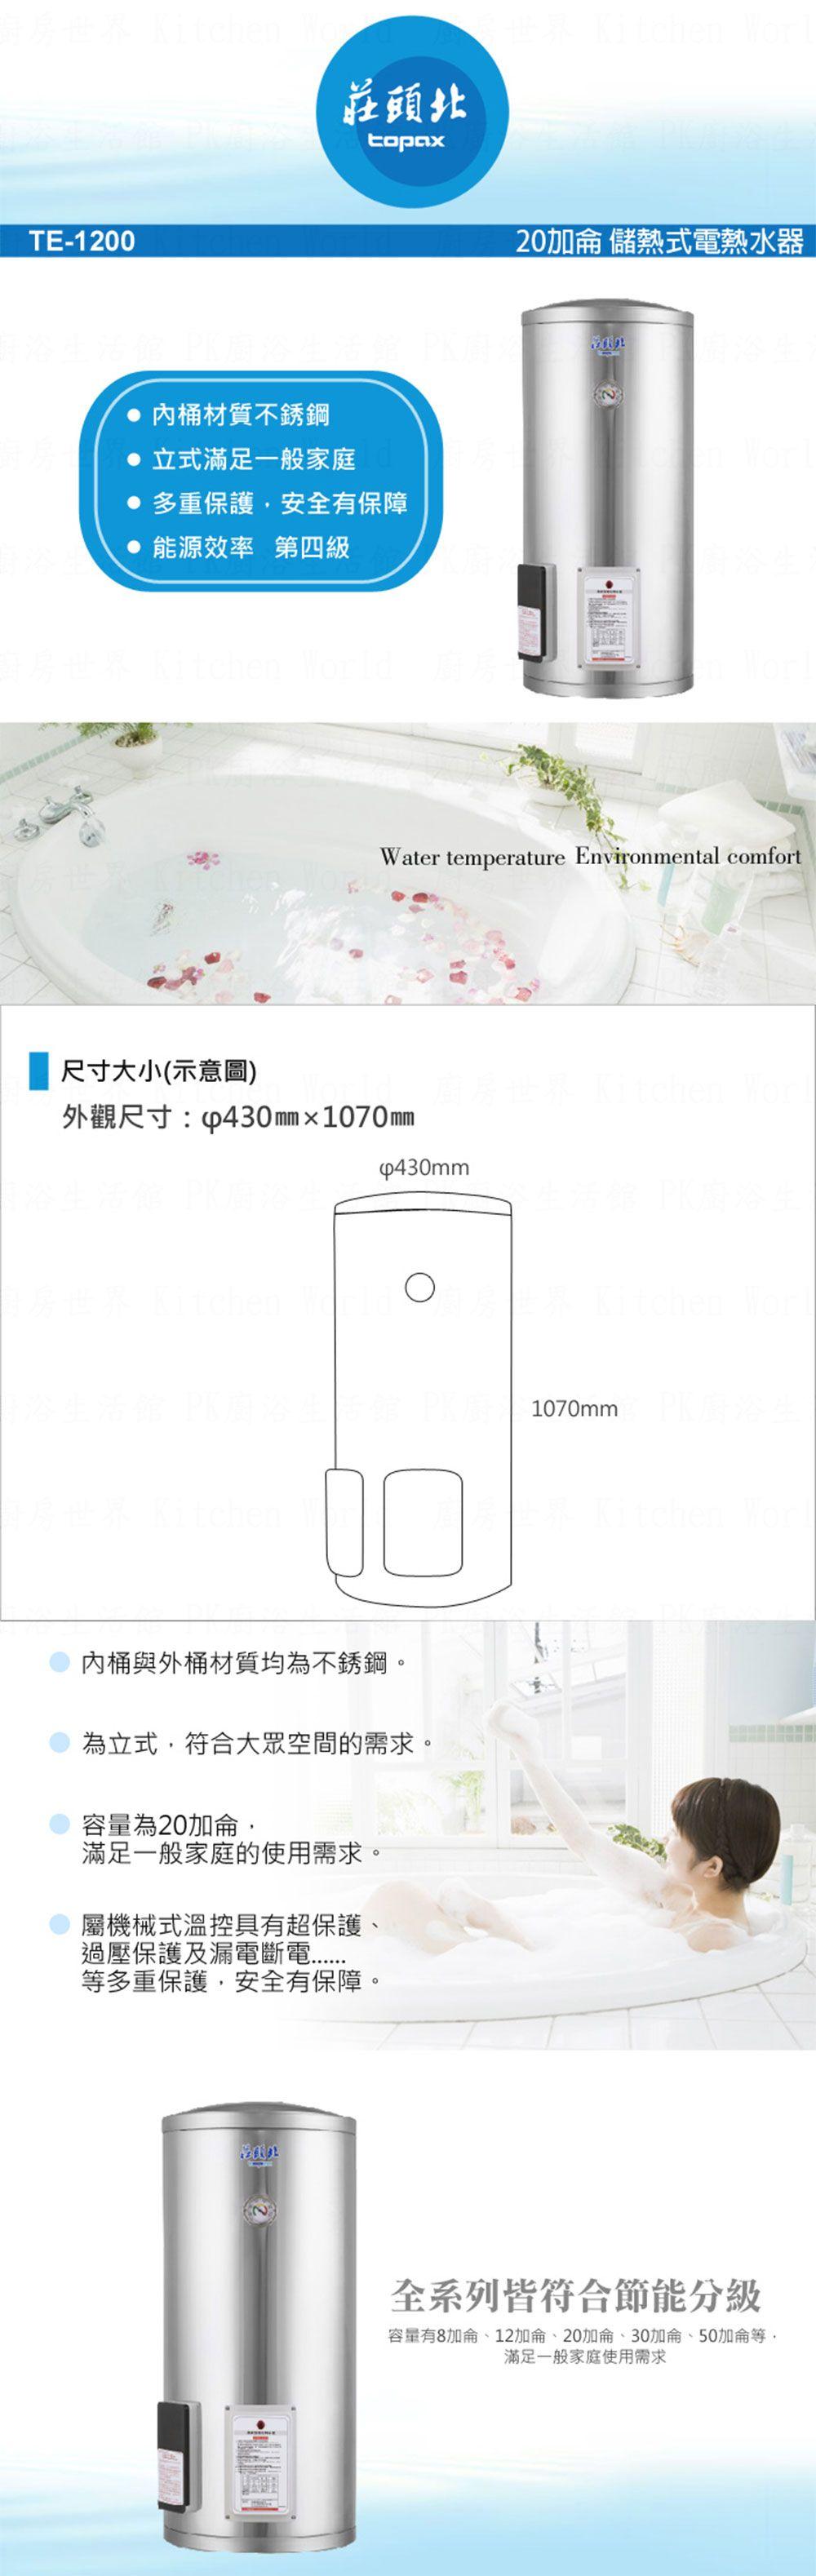 PK/goods/Topax/Water%20Heater/TE-1200-DM-1.jpg